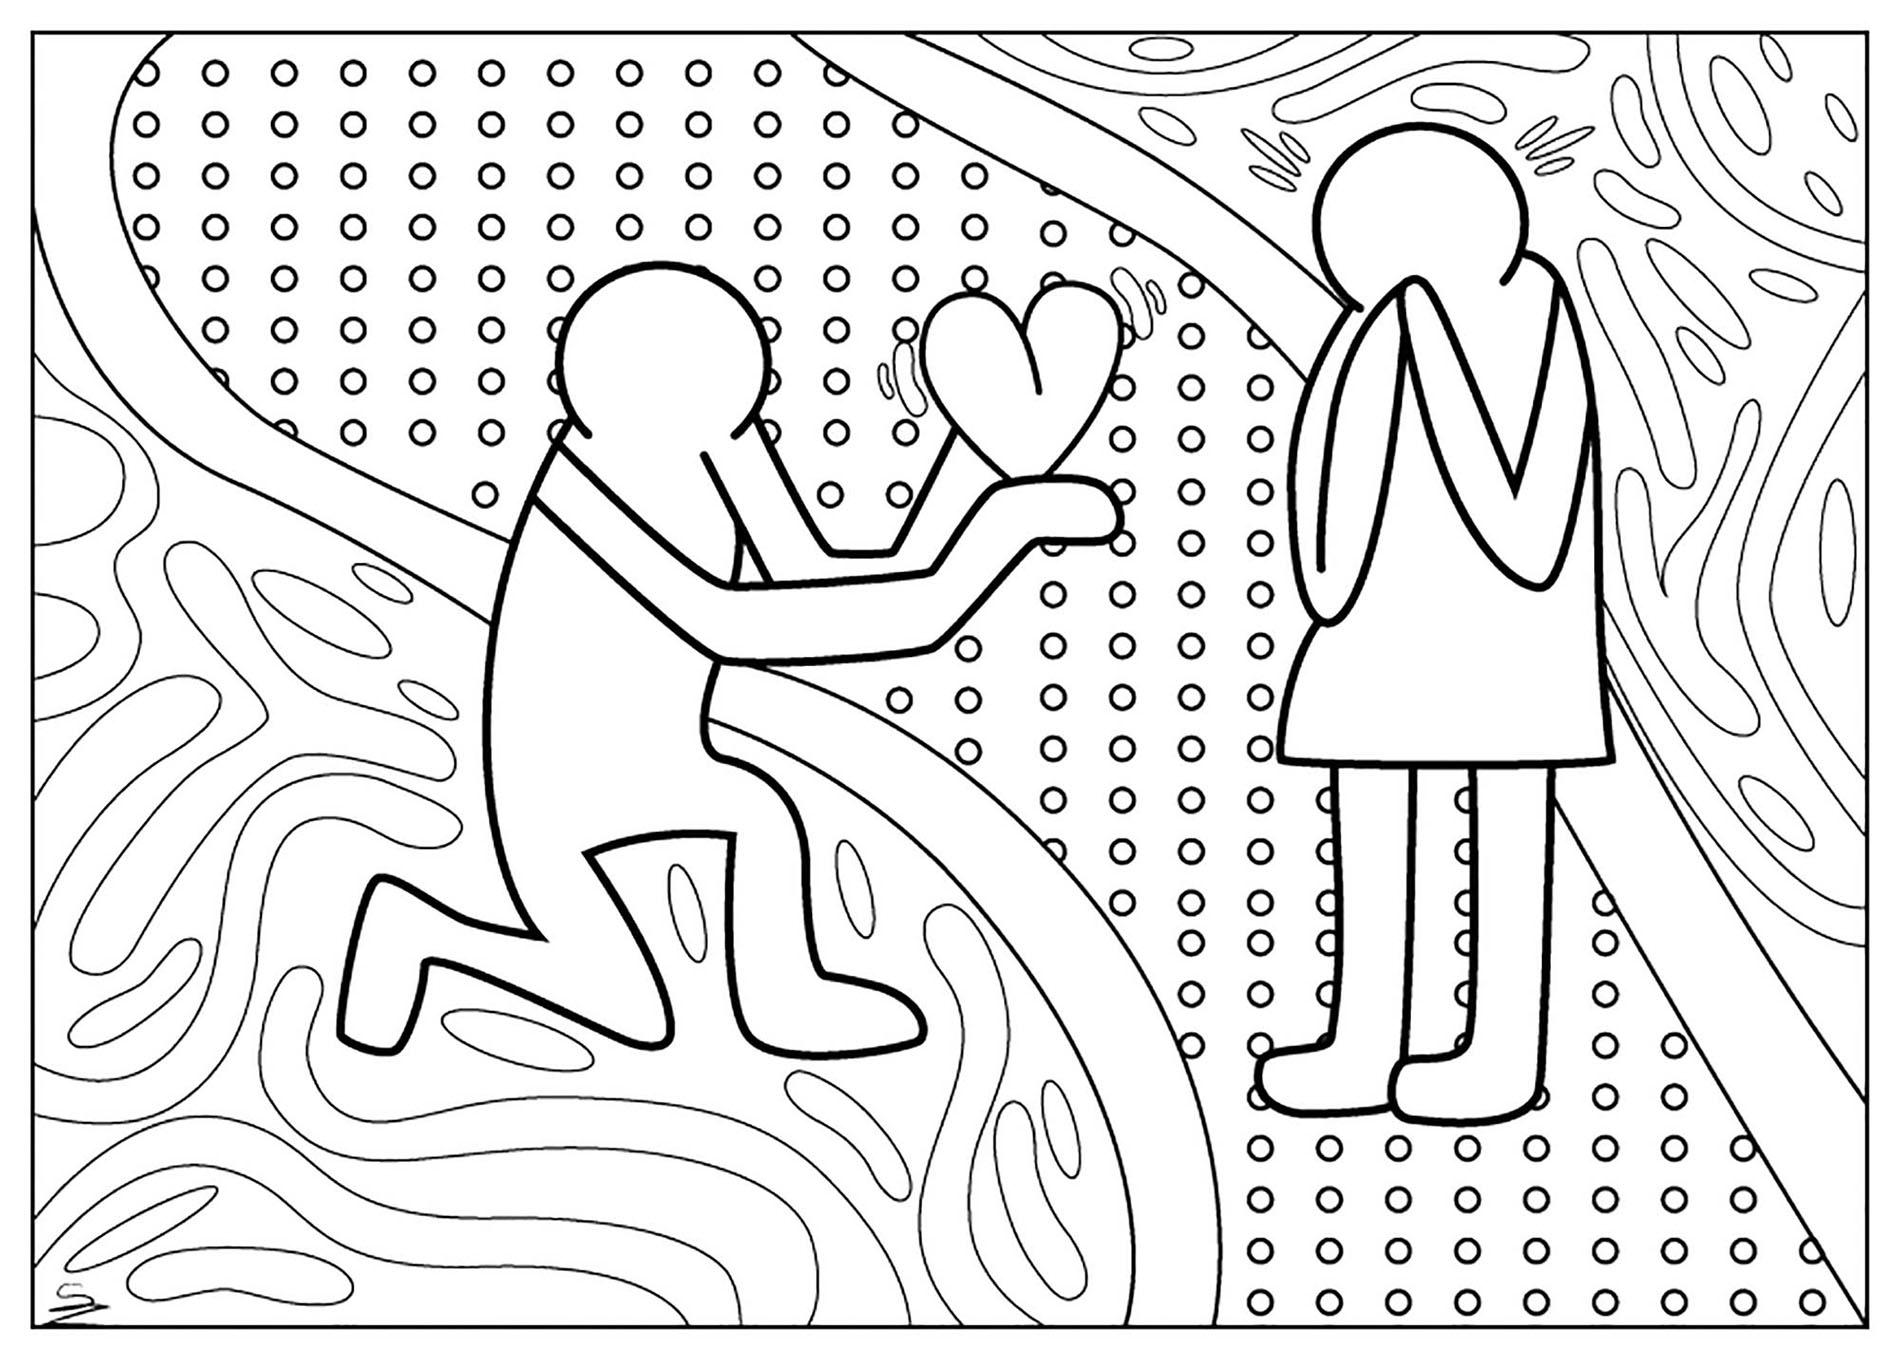 Coloriage inspiré par une oeuvre de Keith Haring